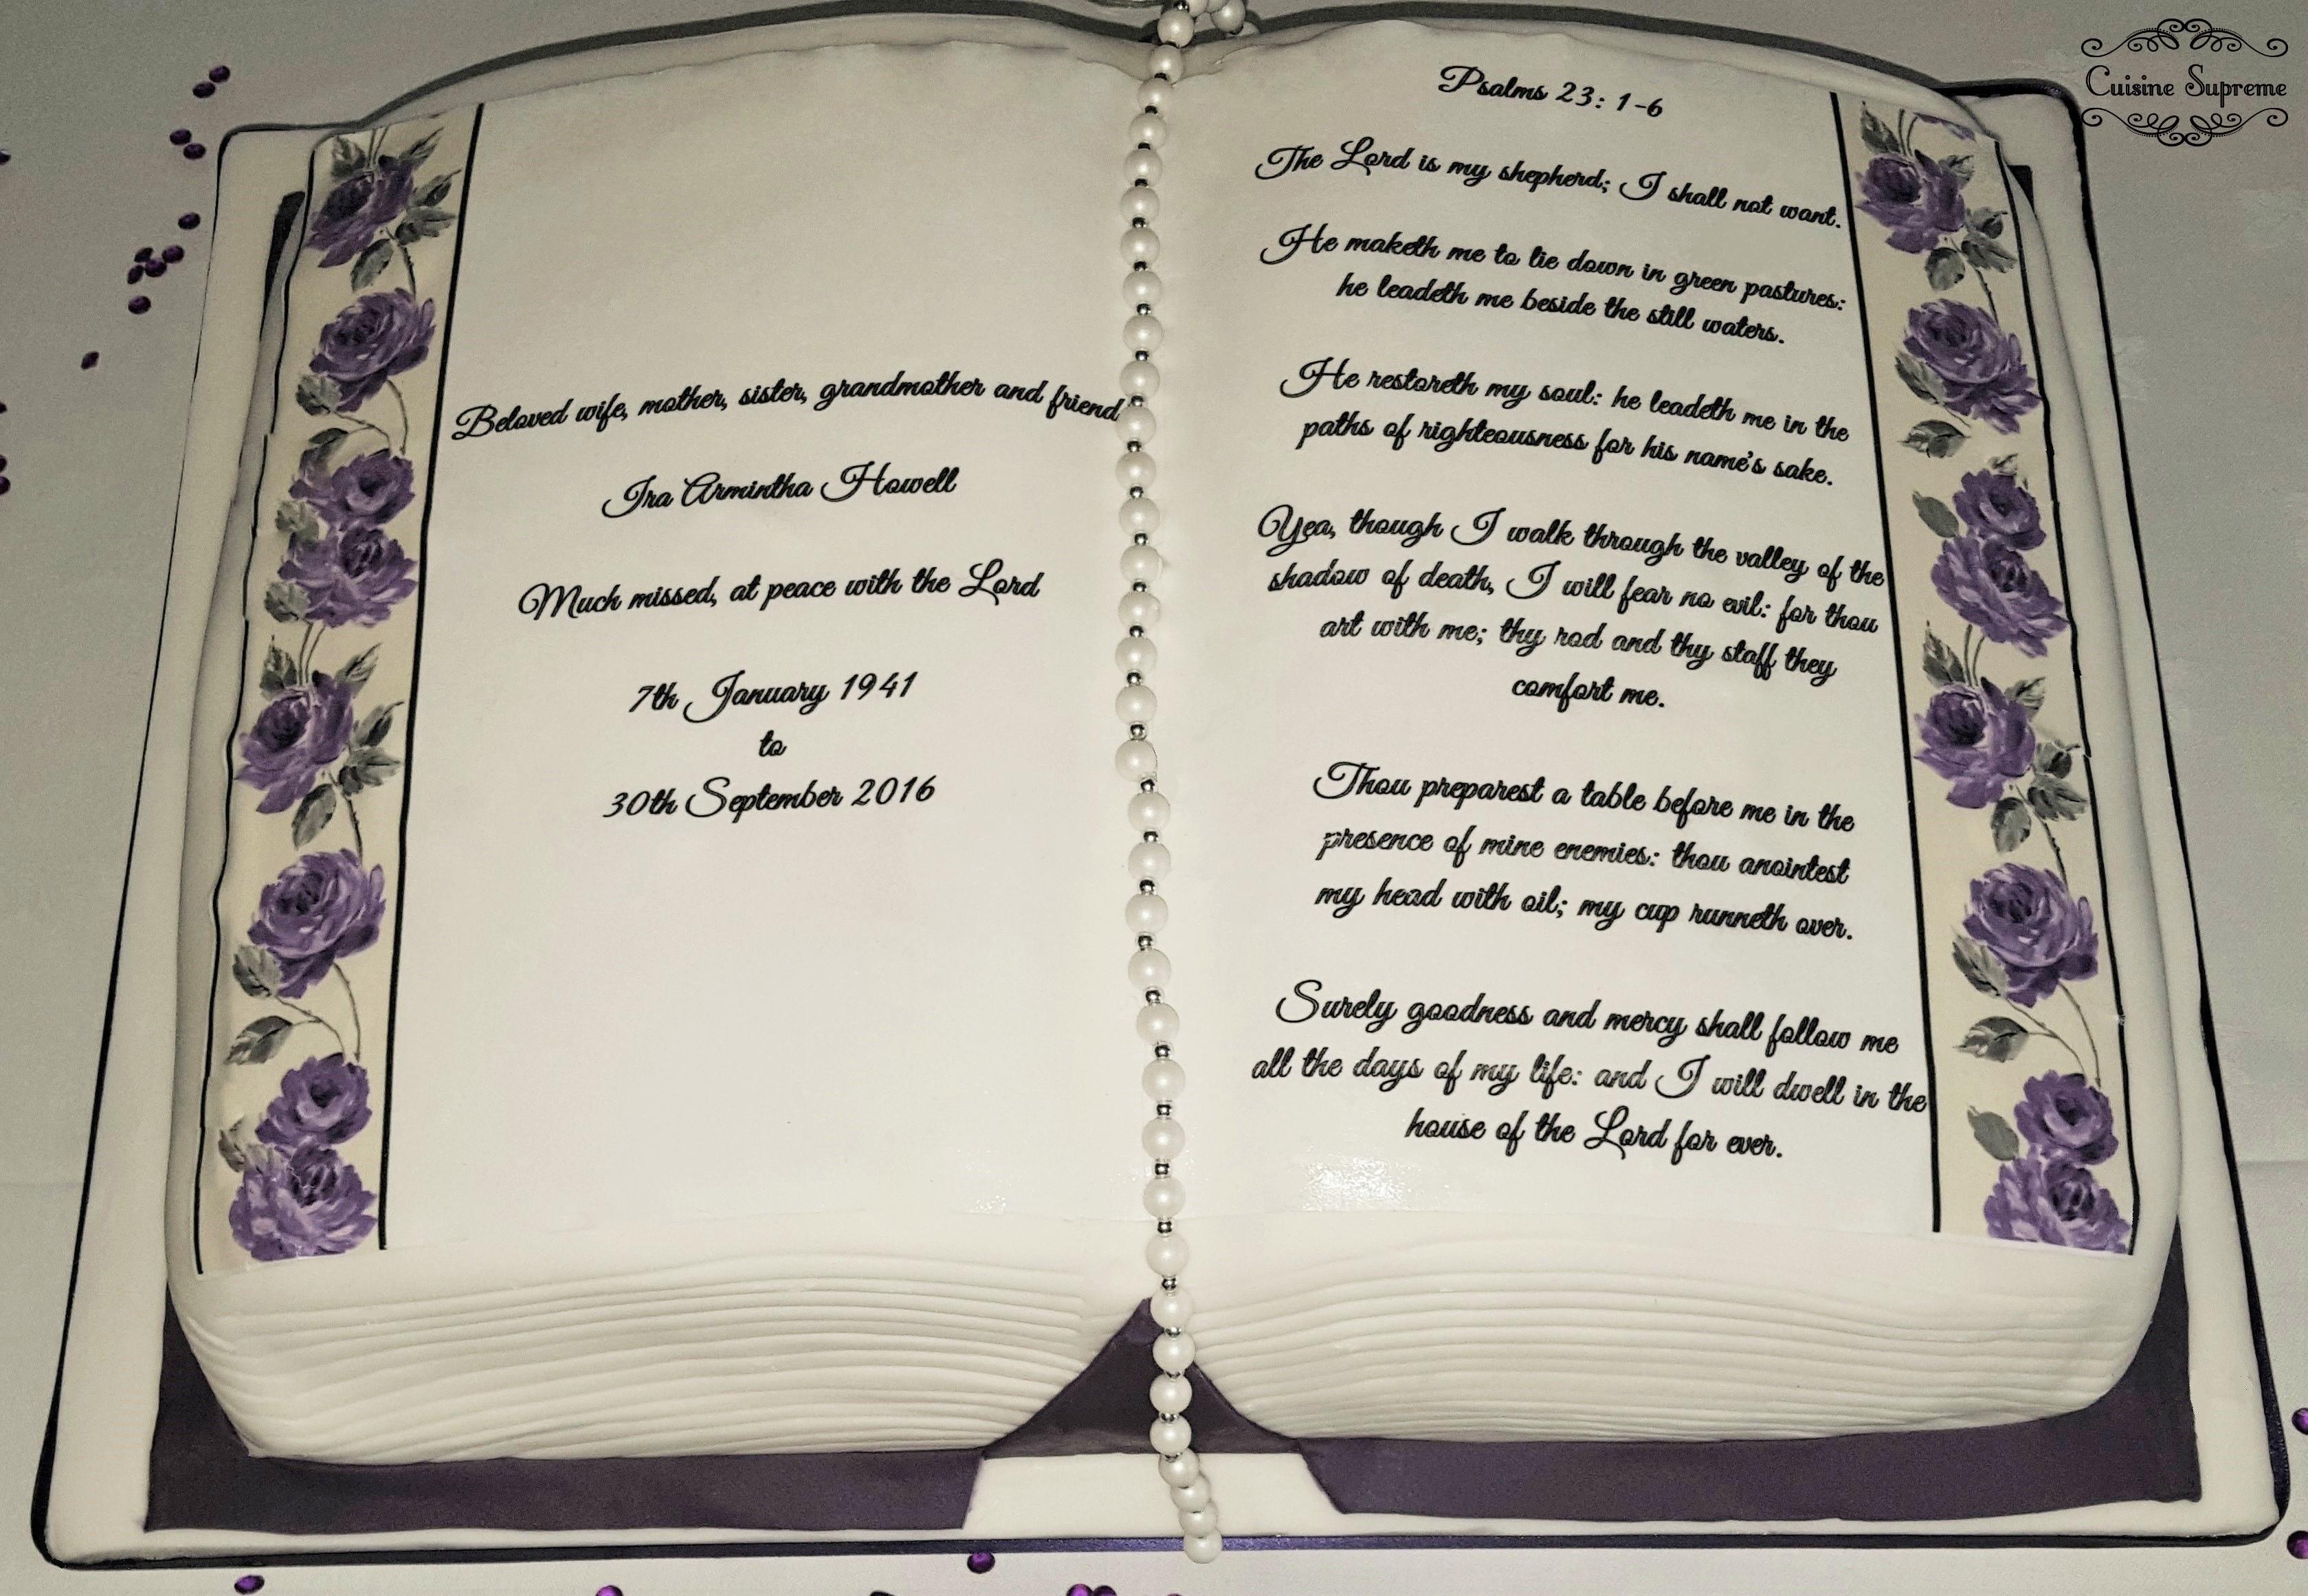 Caribbean Sponge cake - Funeral